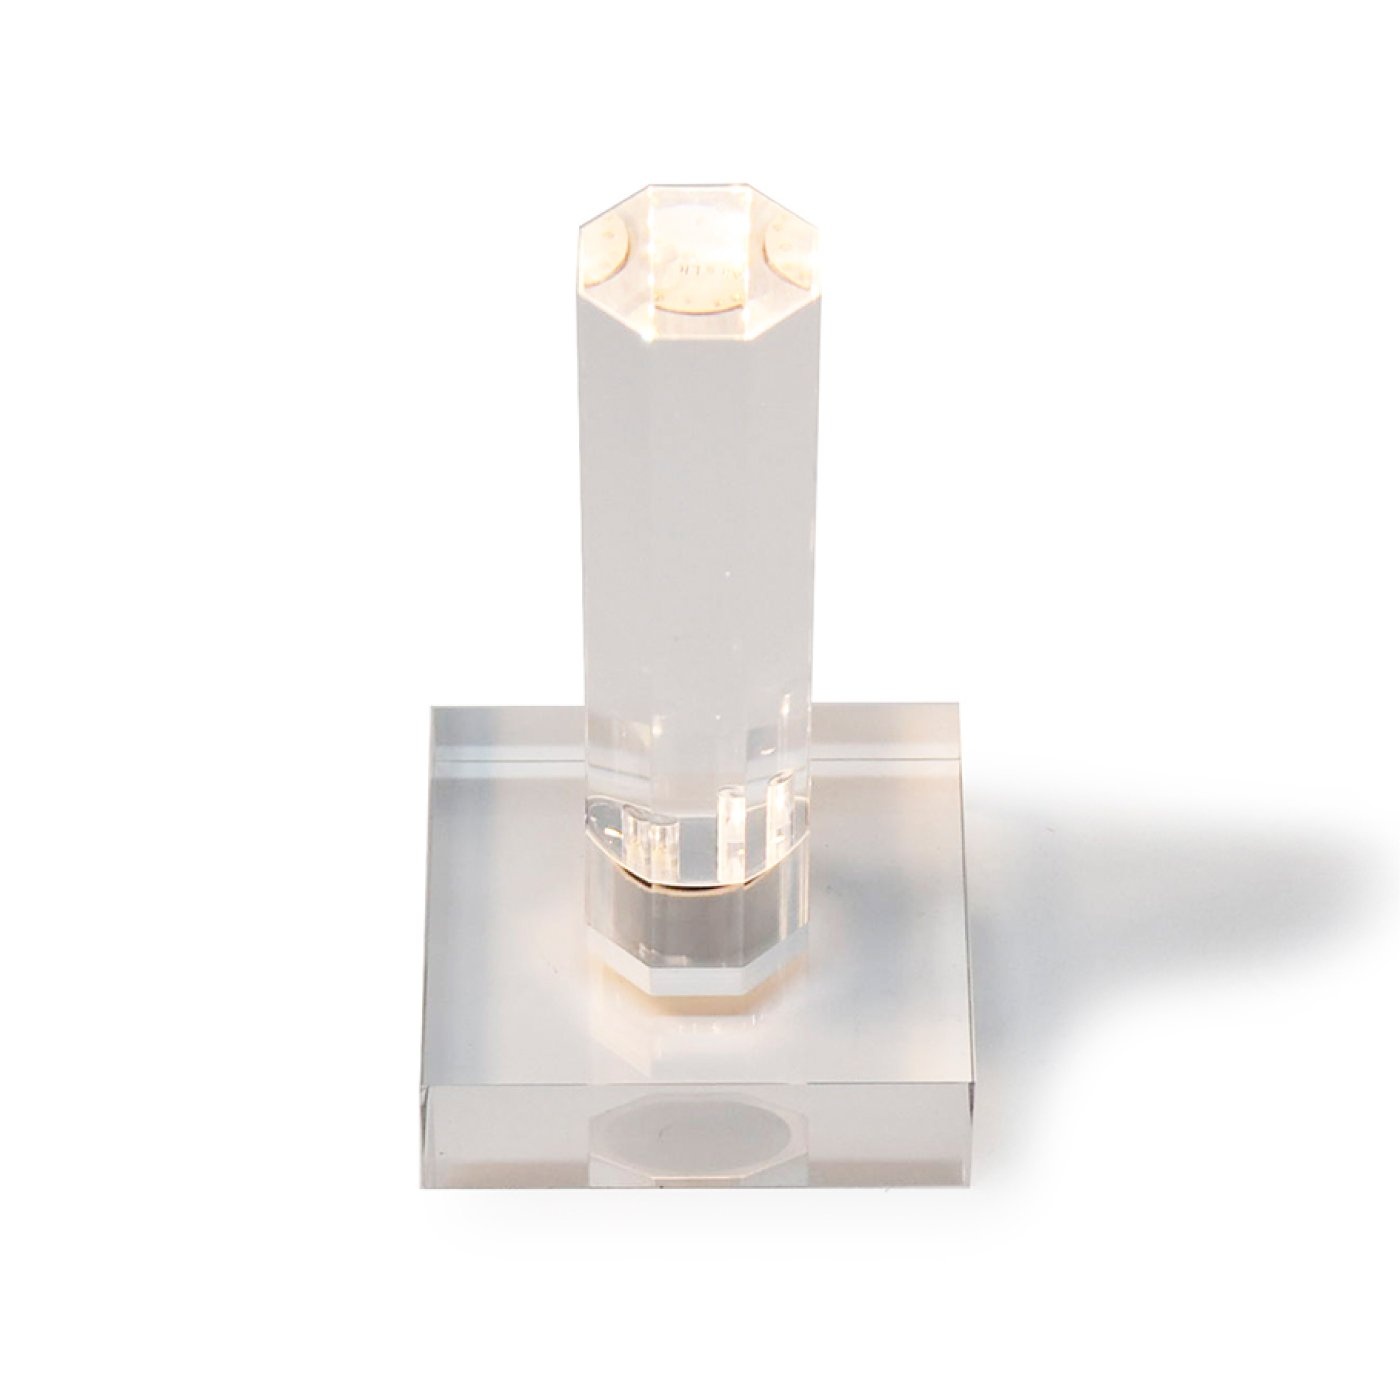 世界一透明な懐中電灯 Air's LIGHT